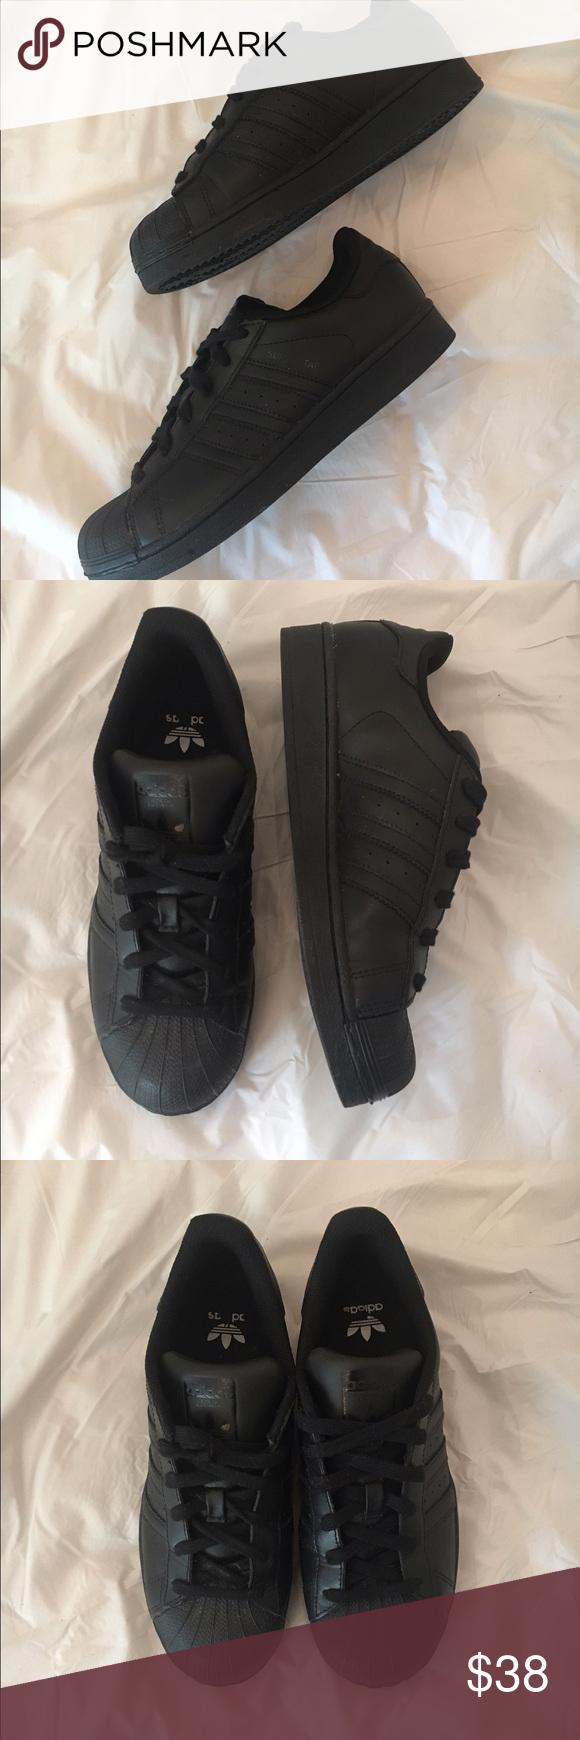 adidas superstar scarpe pinterest black adidas superstar